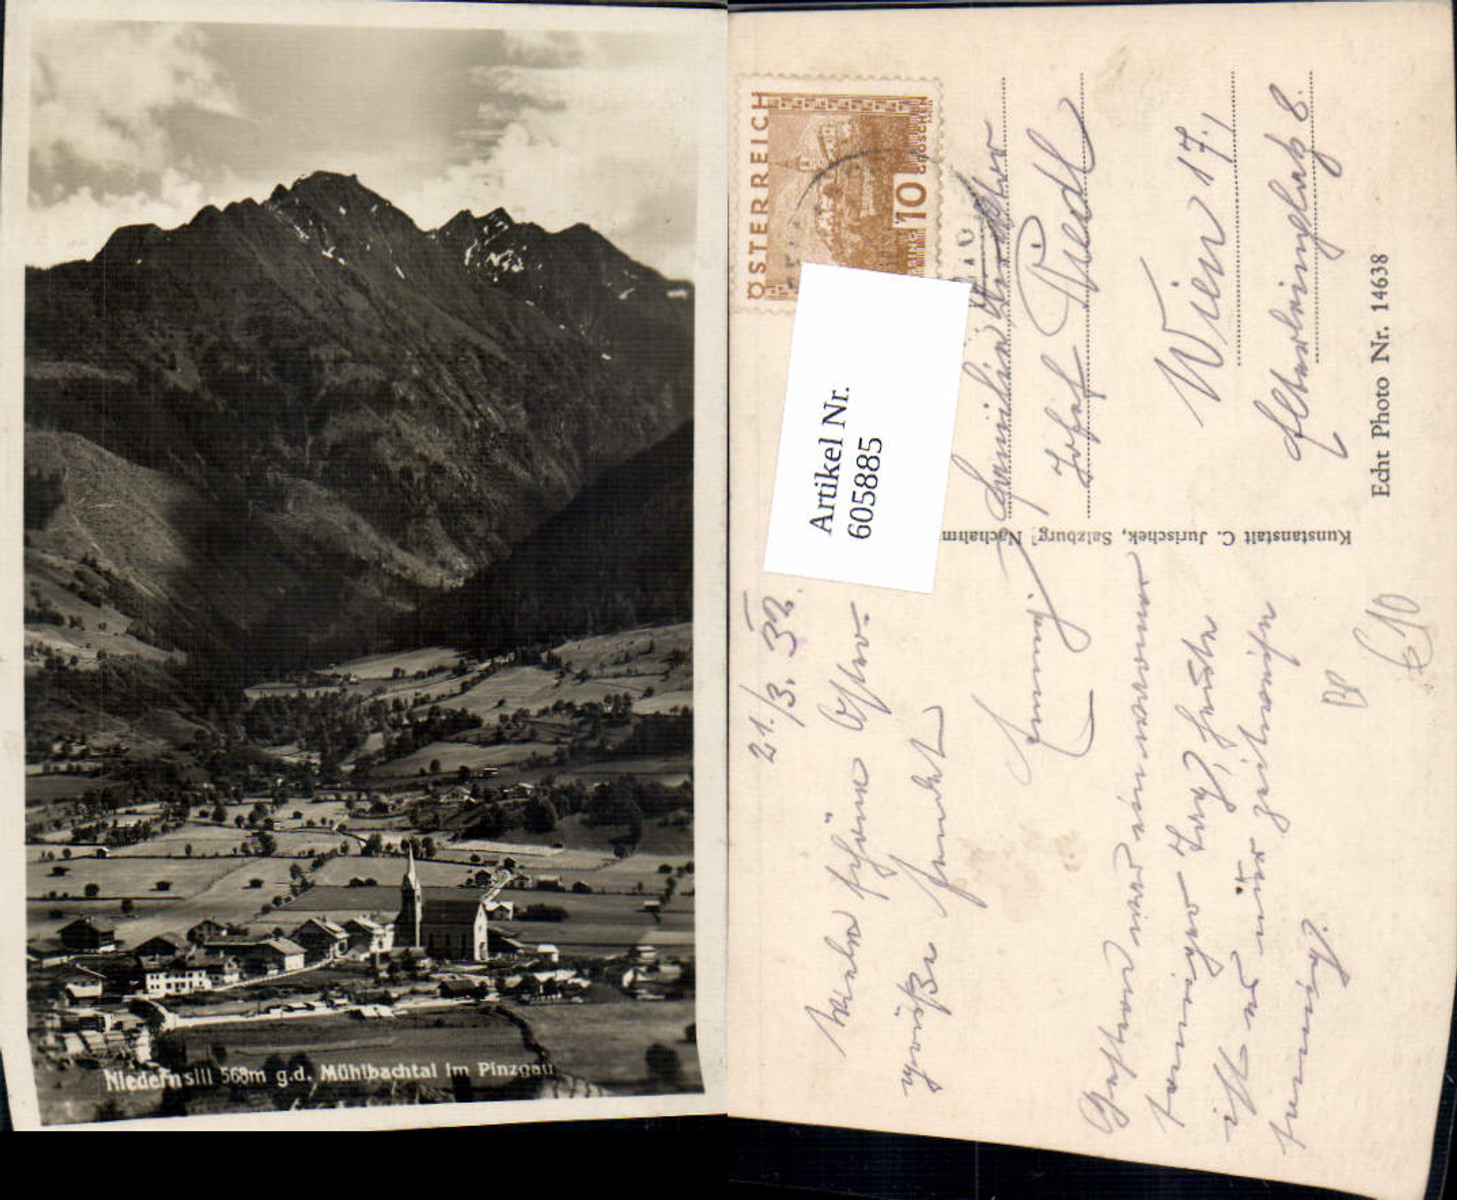 605885,Foto Ak Niedernsill g. d. Mühlbachtal i. Pinzgau Bahnpost 276 Krimml Zell a. See günstig online kaufen